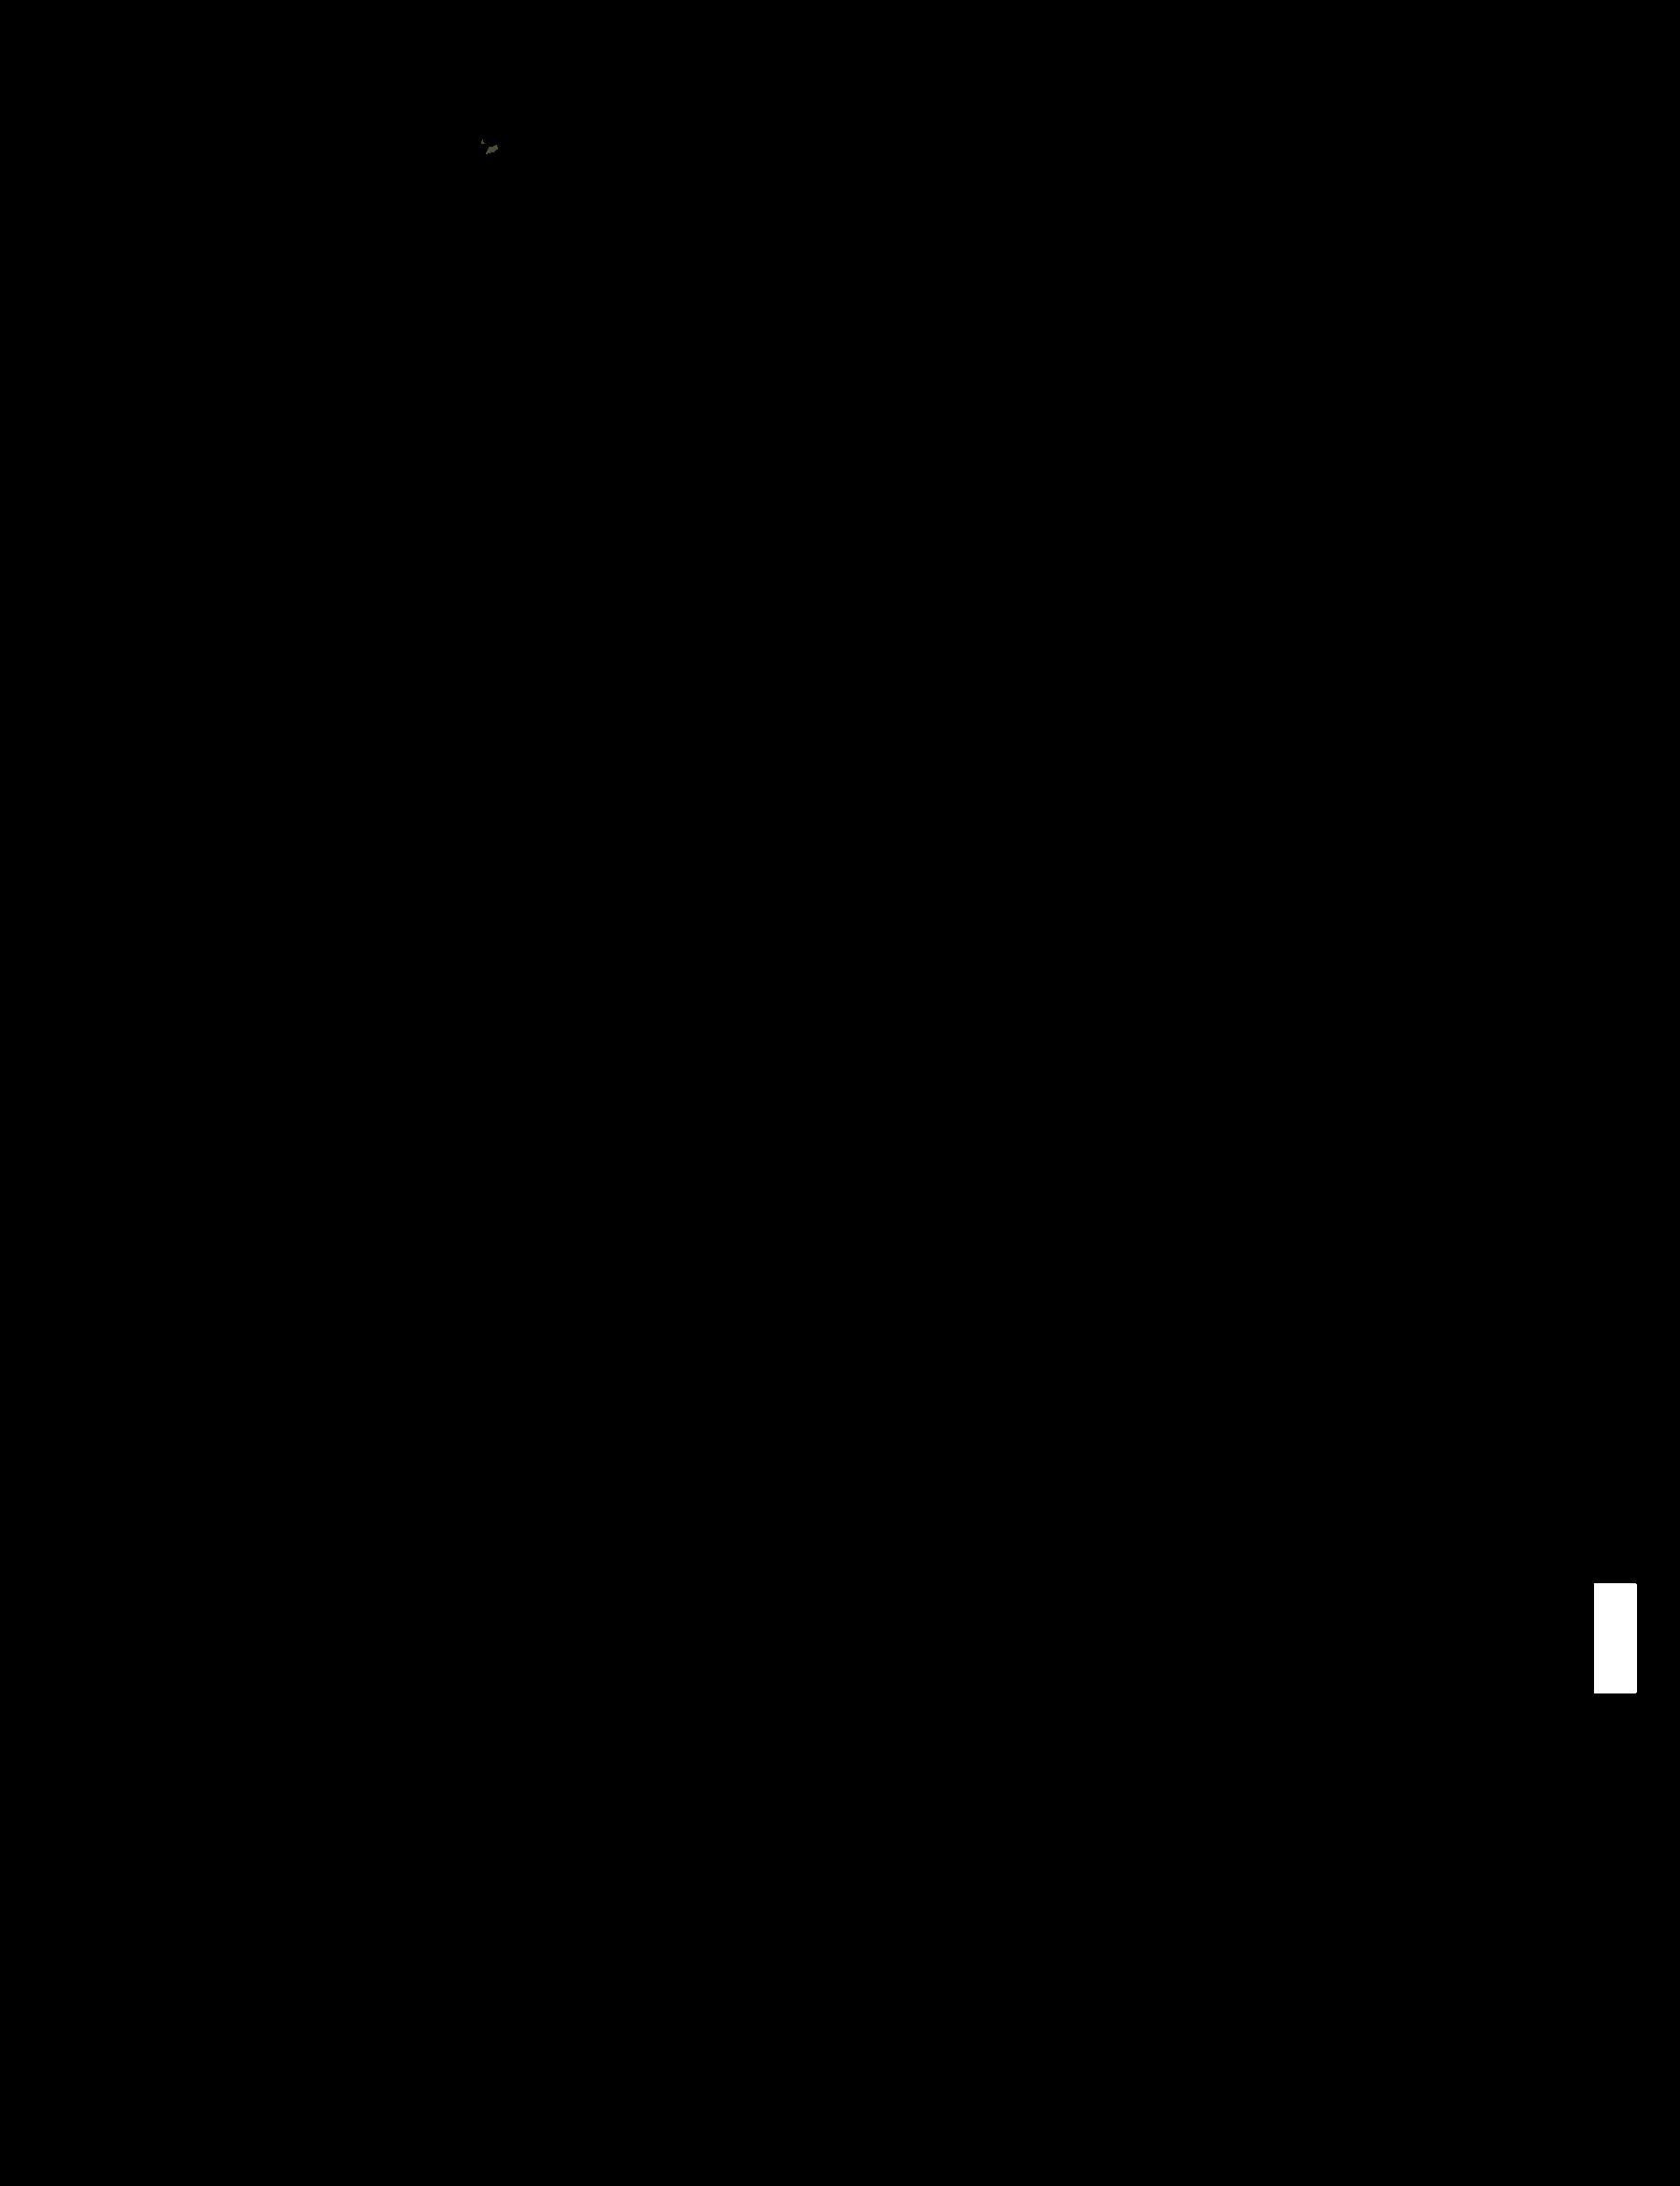 PngItem 394731 - Vertriebspartner